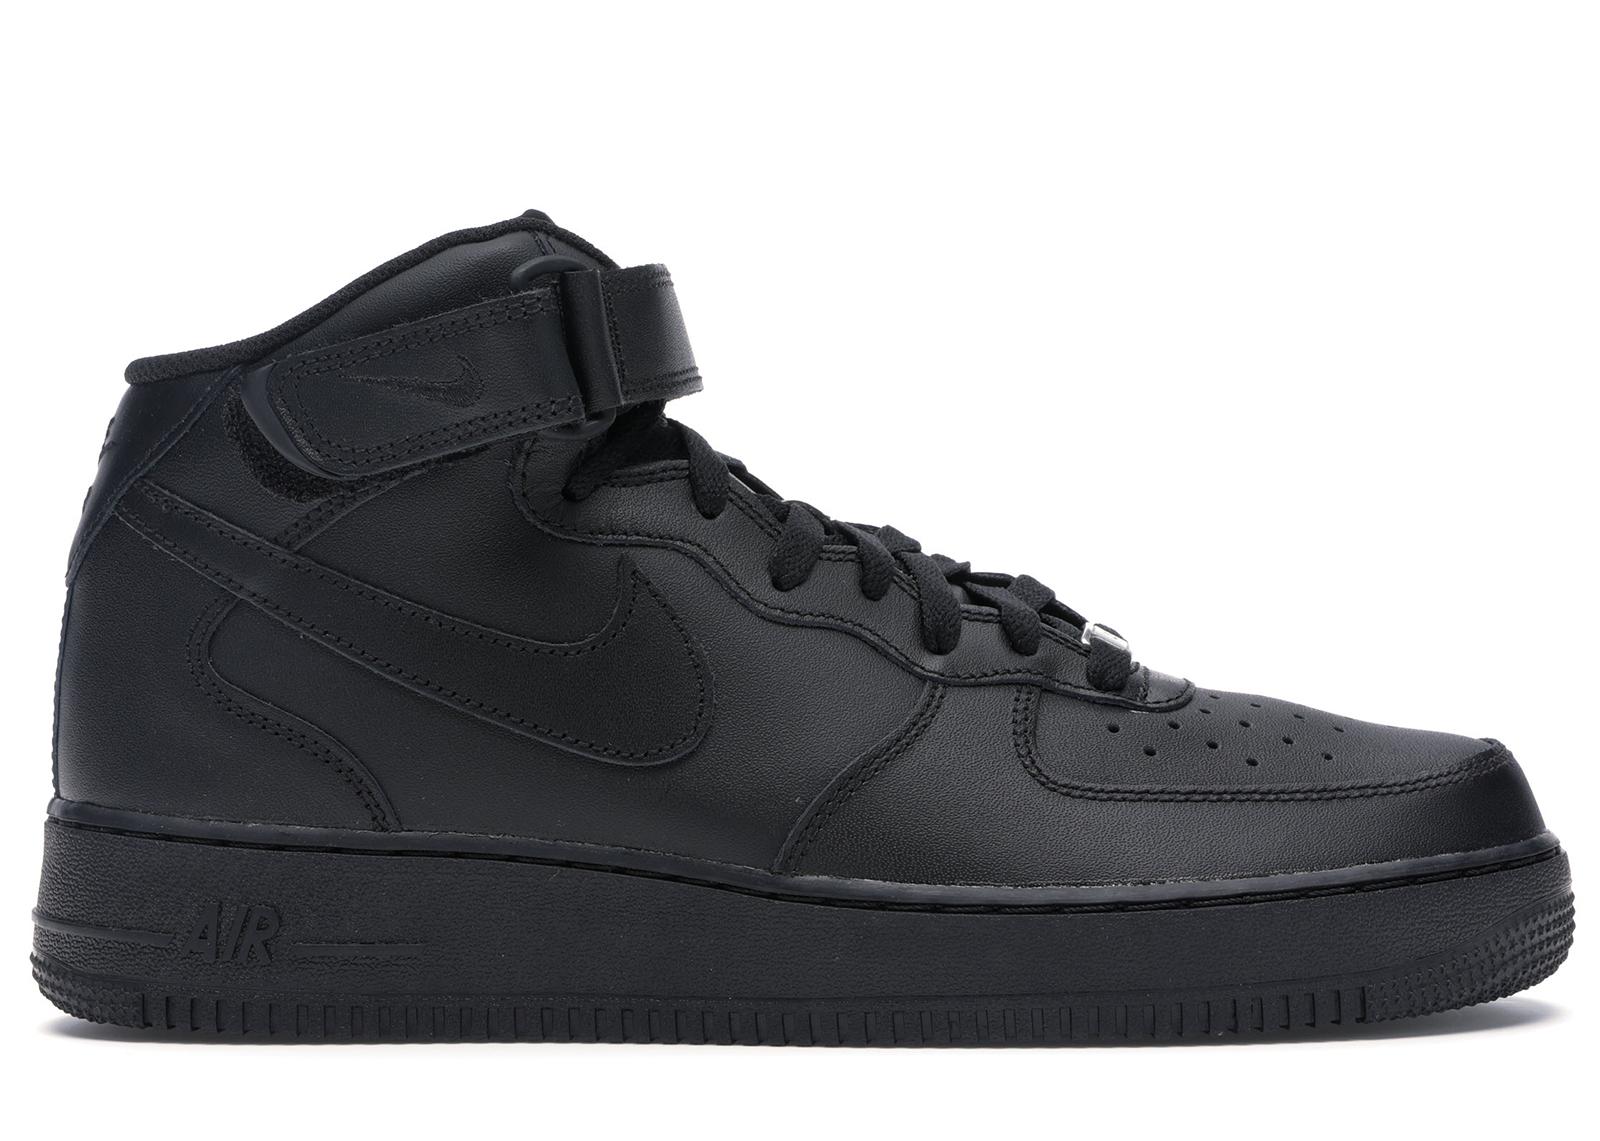 Nike Air Force 1 Mid Black (2016